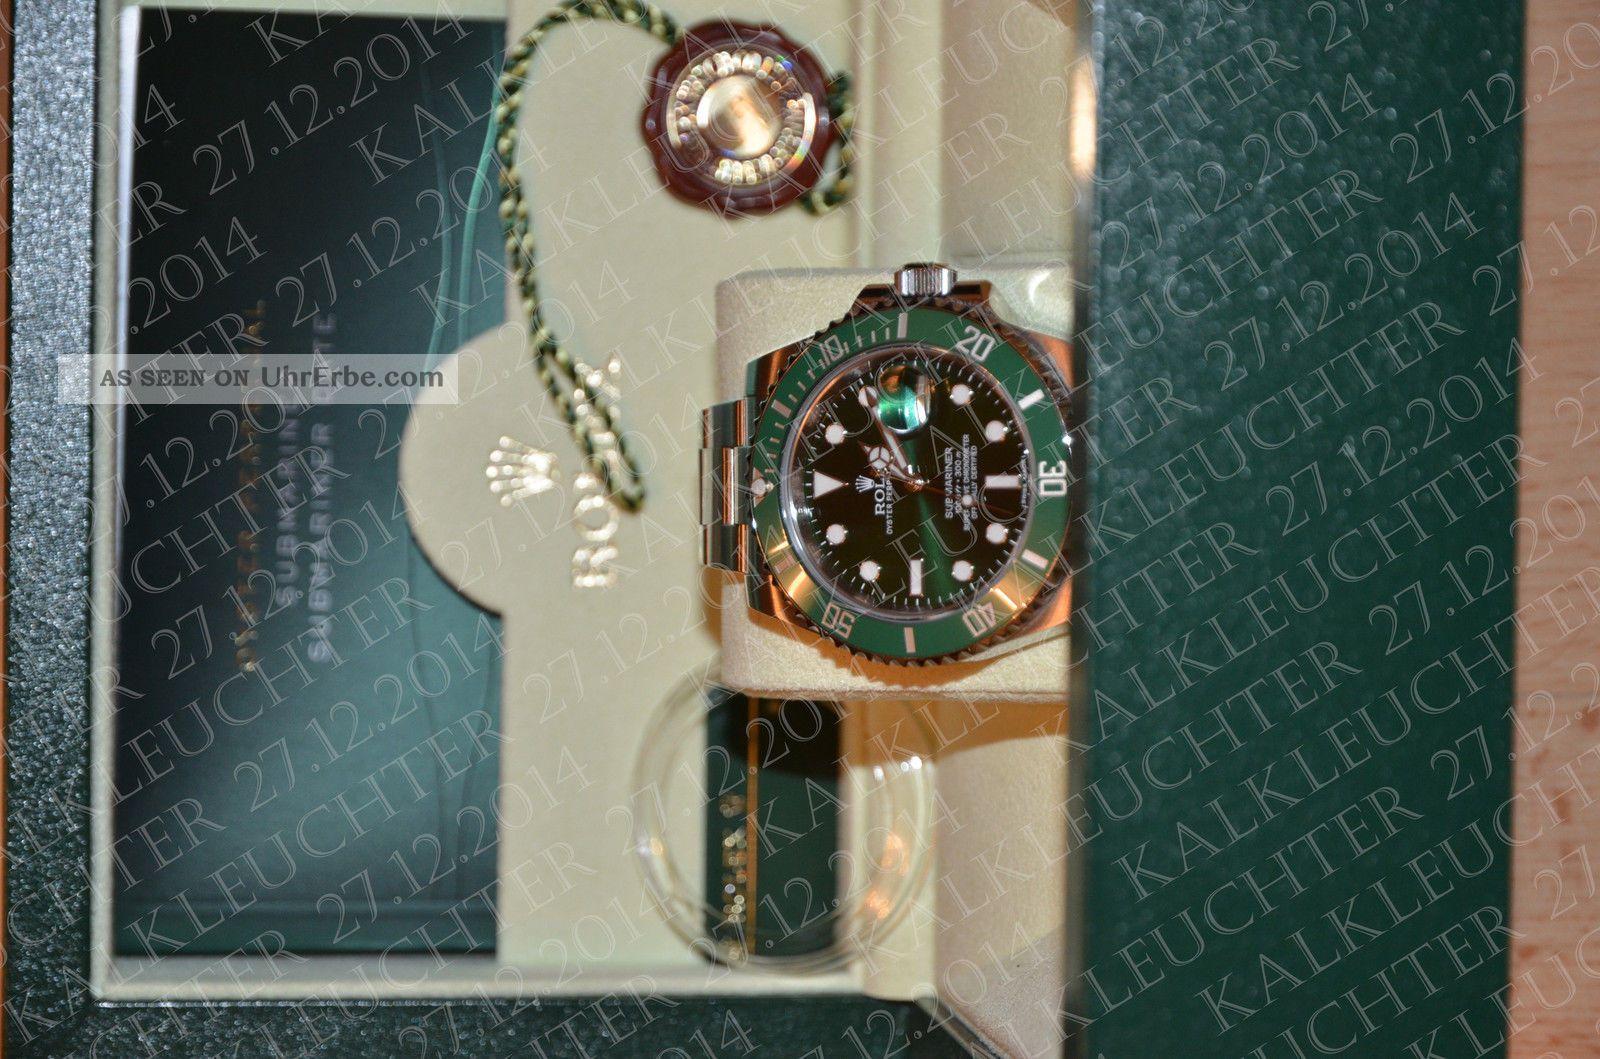 Rolex Oyster Perpetual Submariner Date Armbanduhr Für Herren (116610lv) Armbanduhren Bild